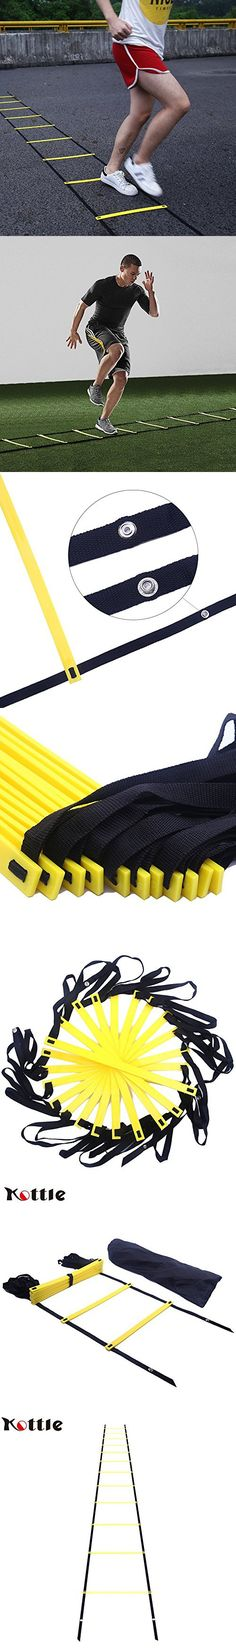 Kottle 19FT 12-Rung Sports Agility Ladder Speed Ladder for Speed, Football Fitness Feet Training